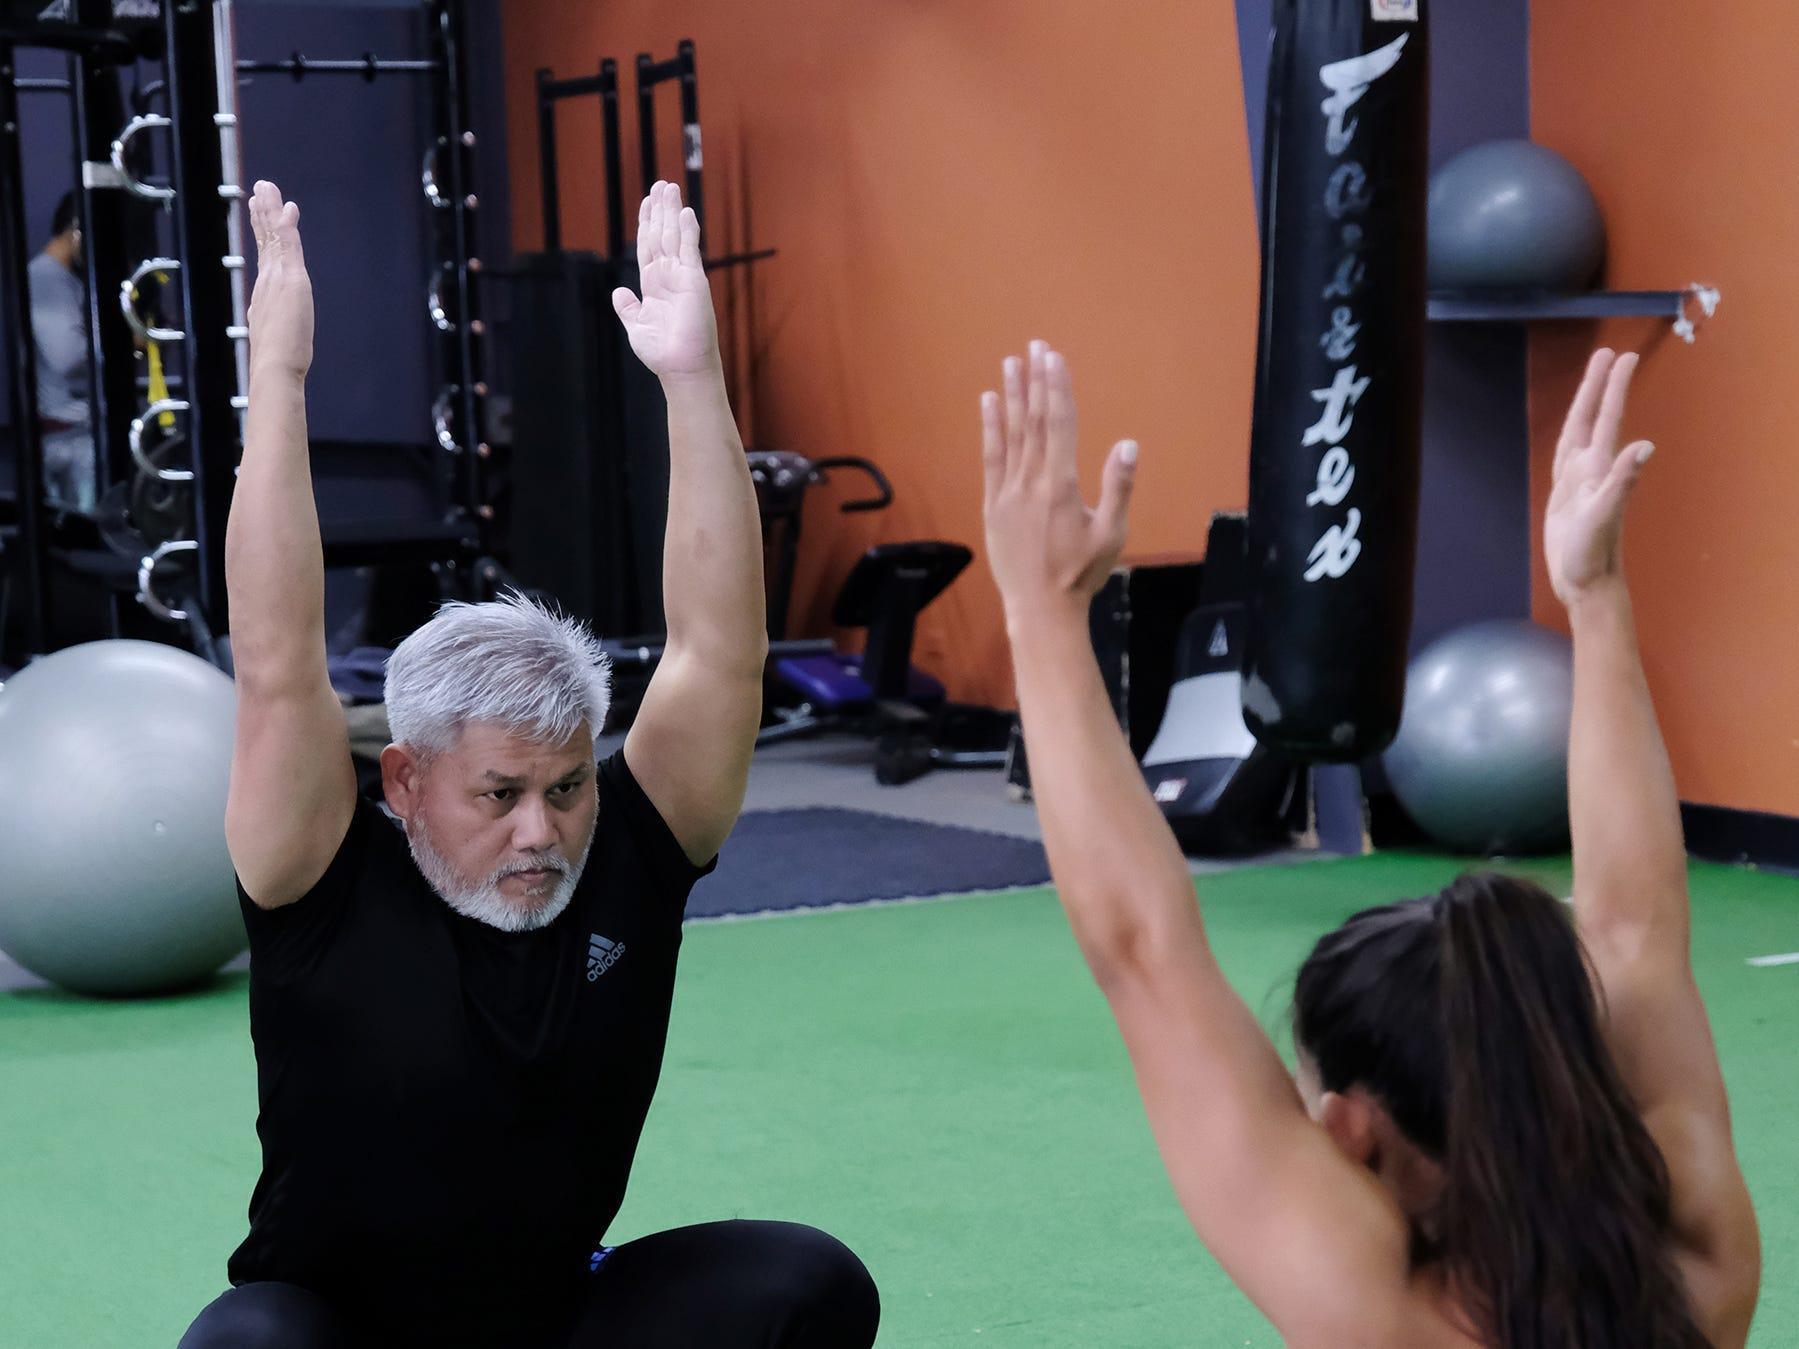 Steve Oshiro does a warm up exercise with Jeralyn Mesa at Paradise Fitness in Hagatna November 15, 2018.